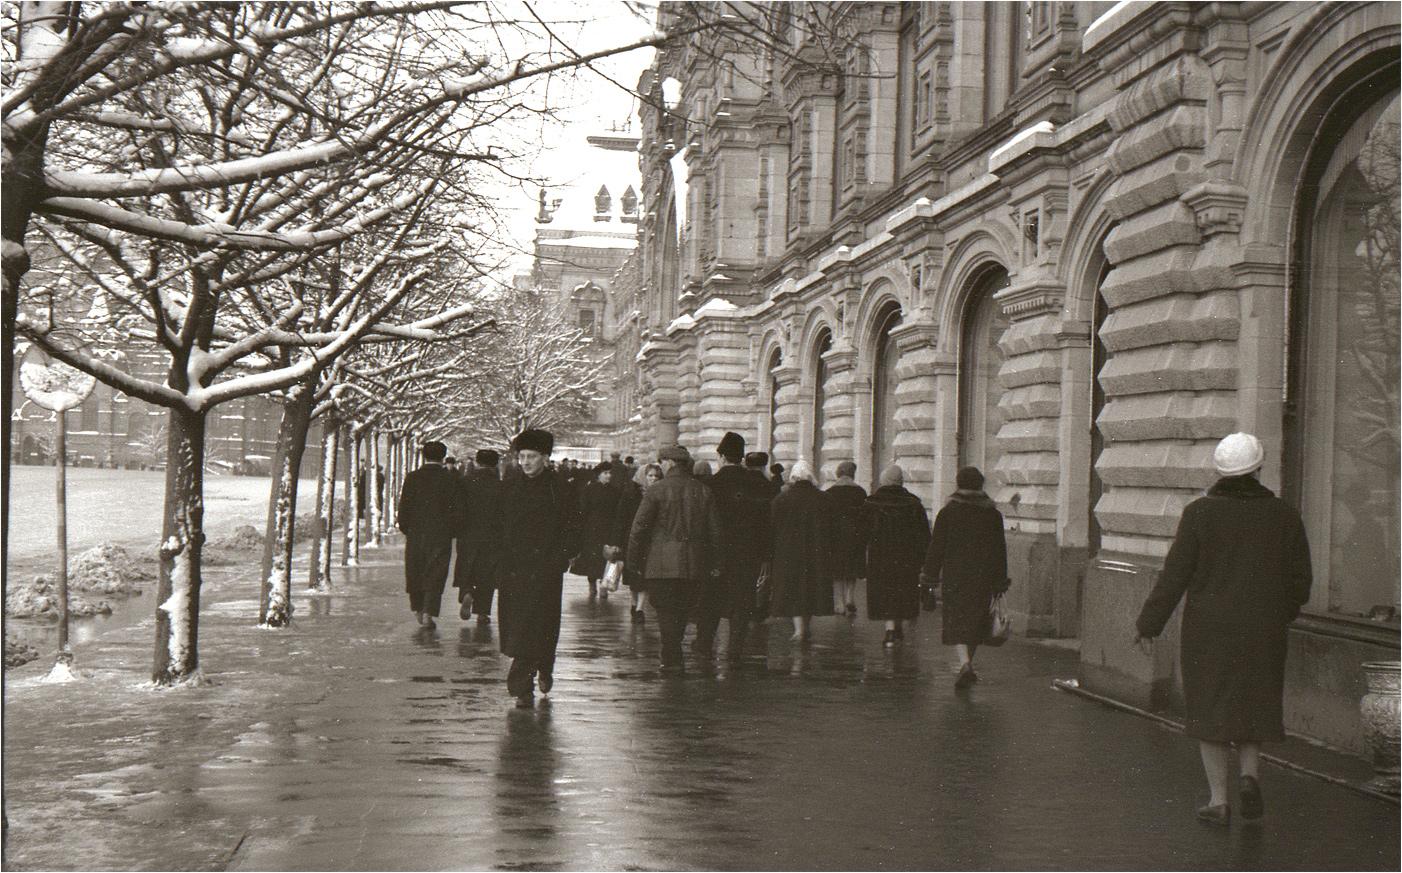 56. 1962. Красная площадь, ГУМ